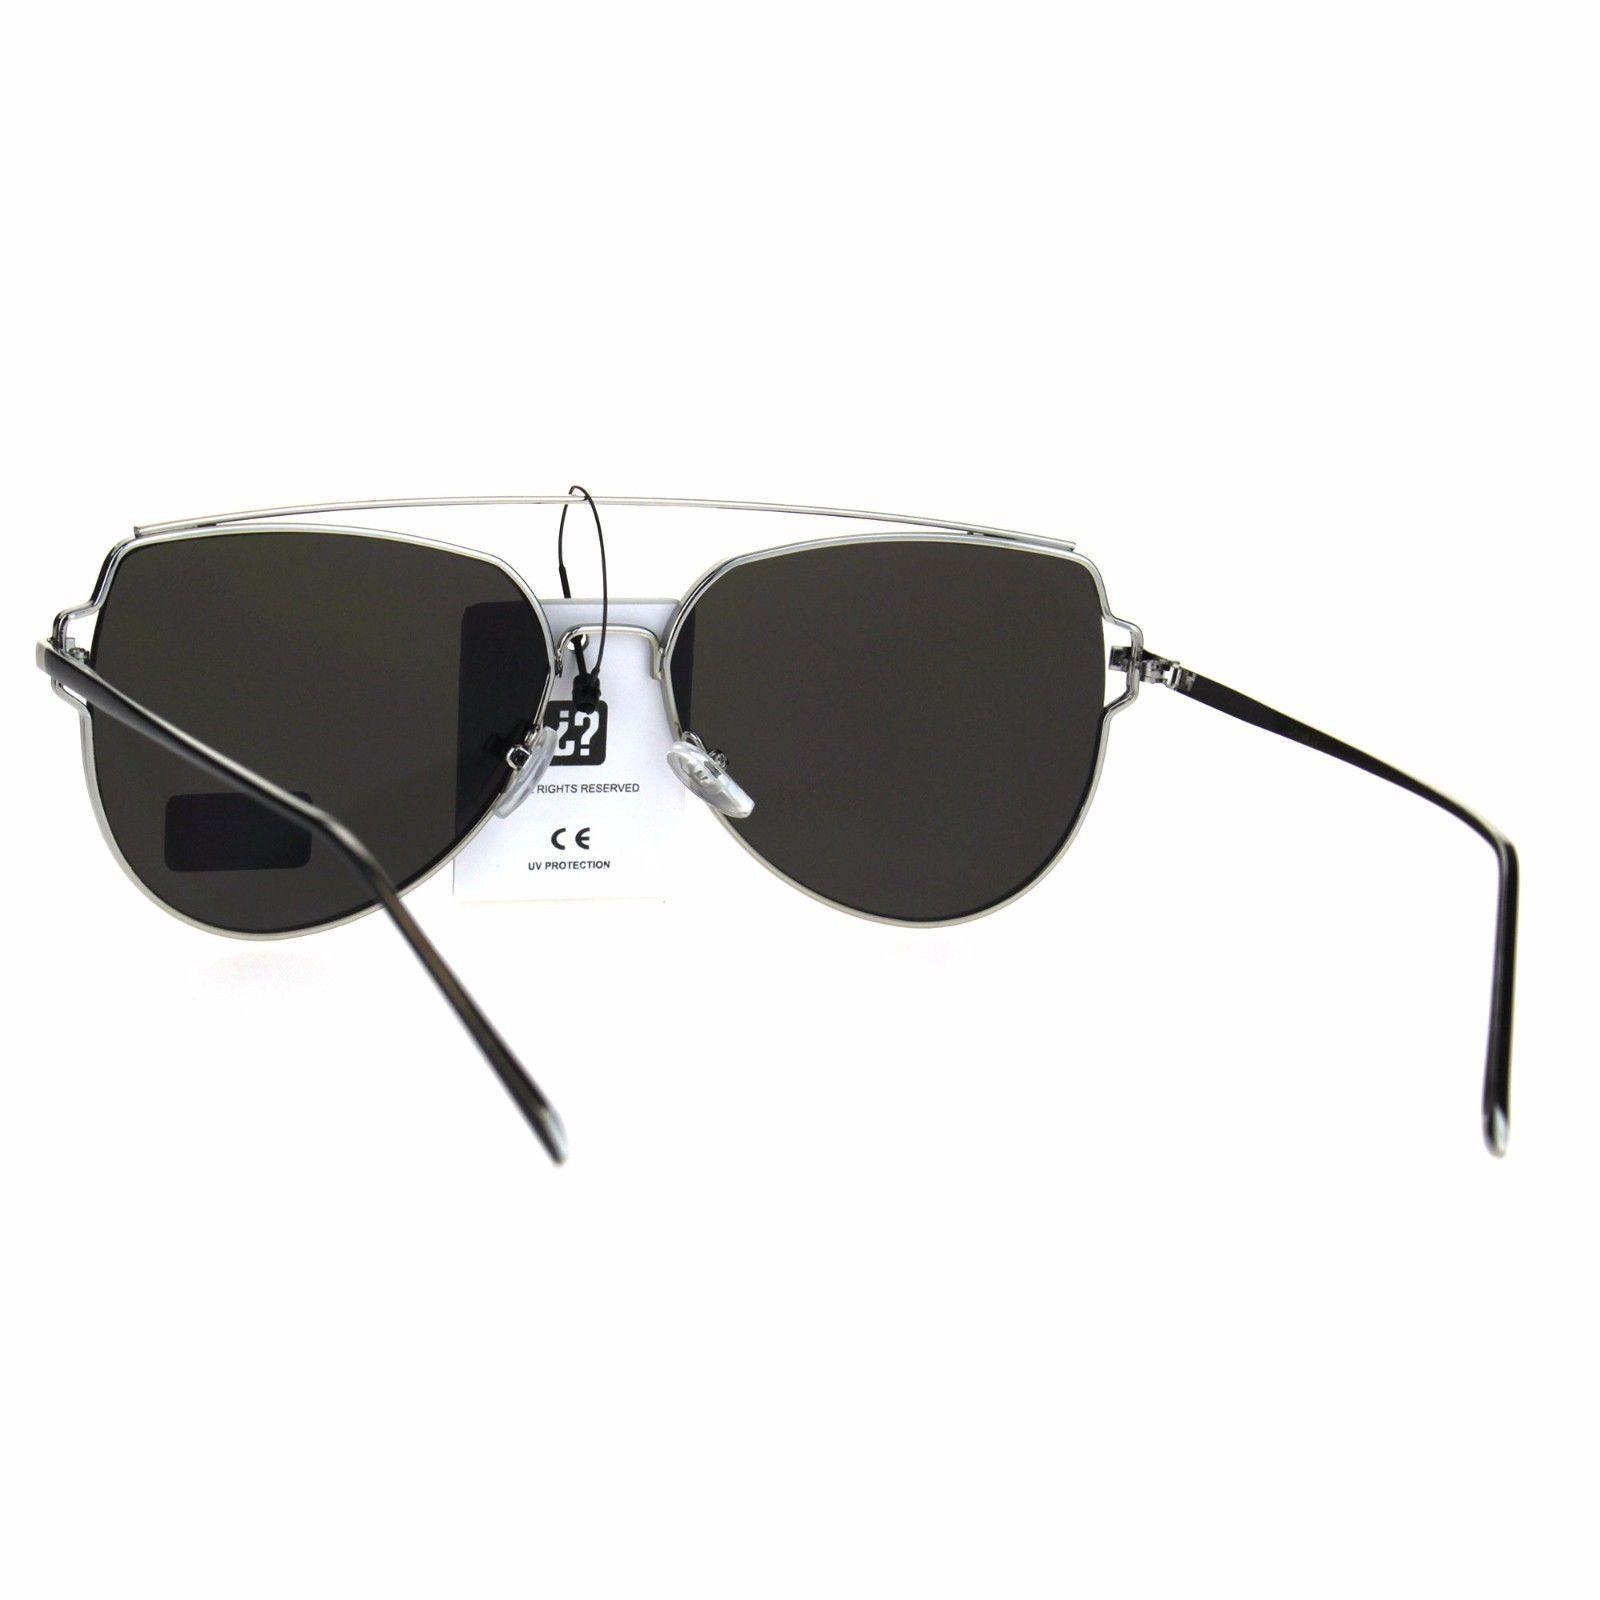 54f864d7ead ... Air Force Flat Top Bar Squared Retro Pilots Metal Rim Sunglasses ...